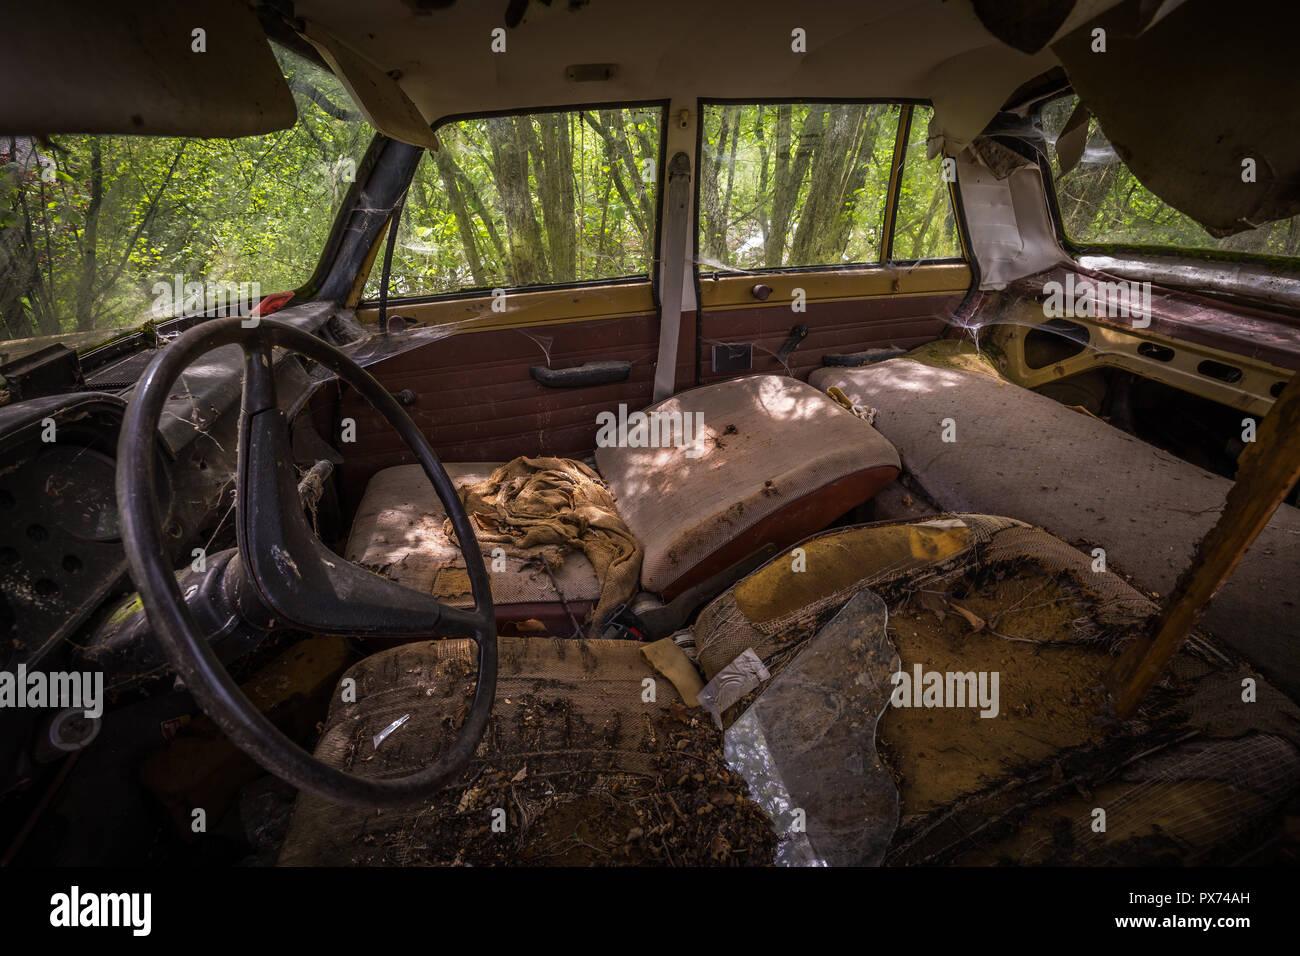 Interior of forgotten car decaying in the garden, dashboard, urbex Czech republic - Stock Image